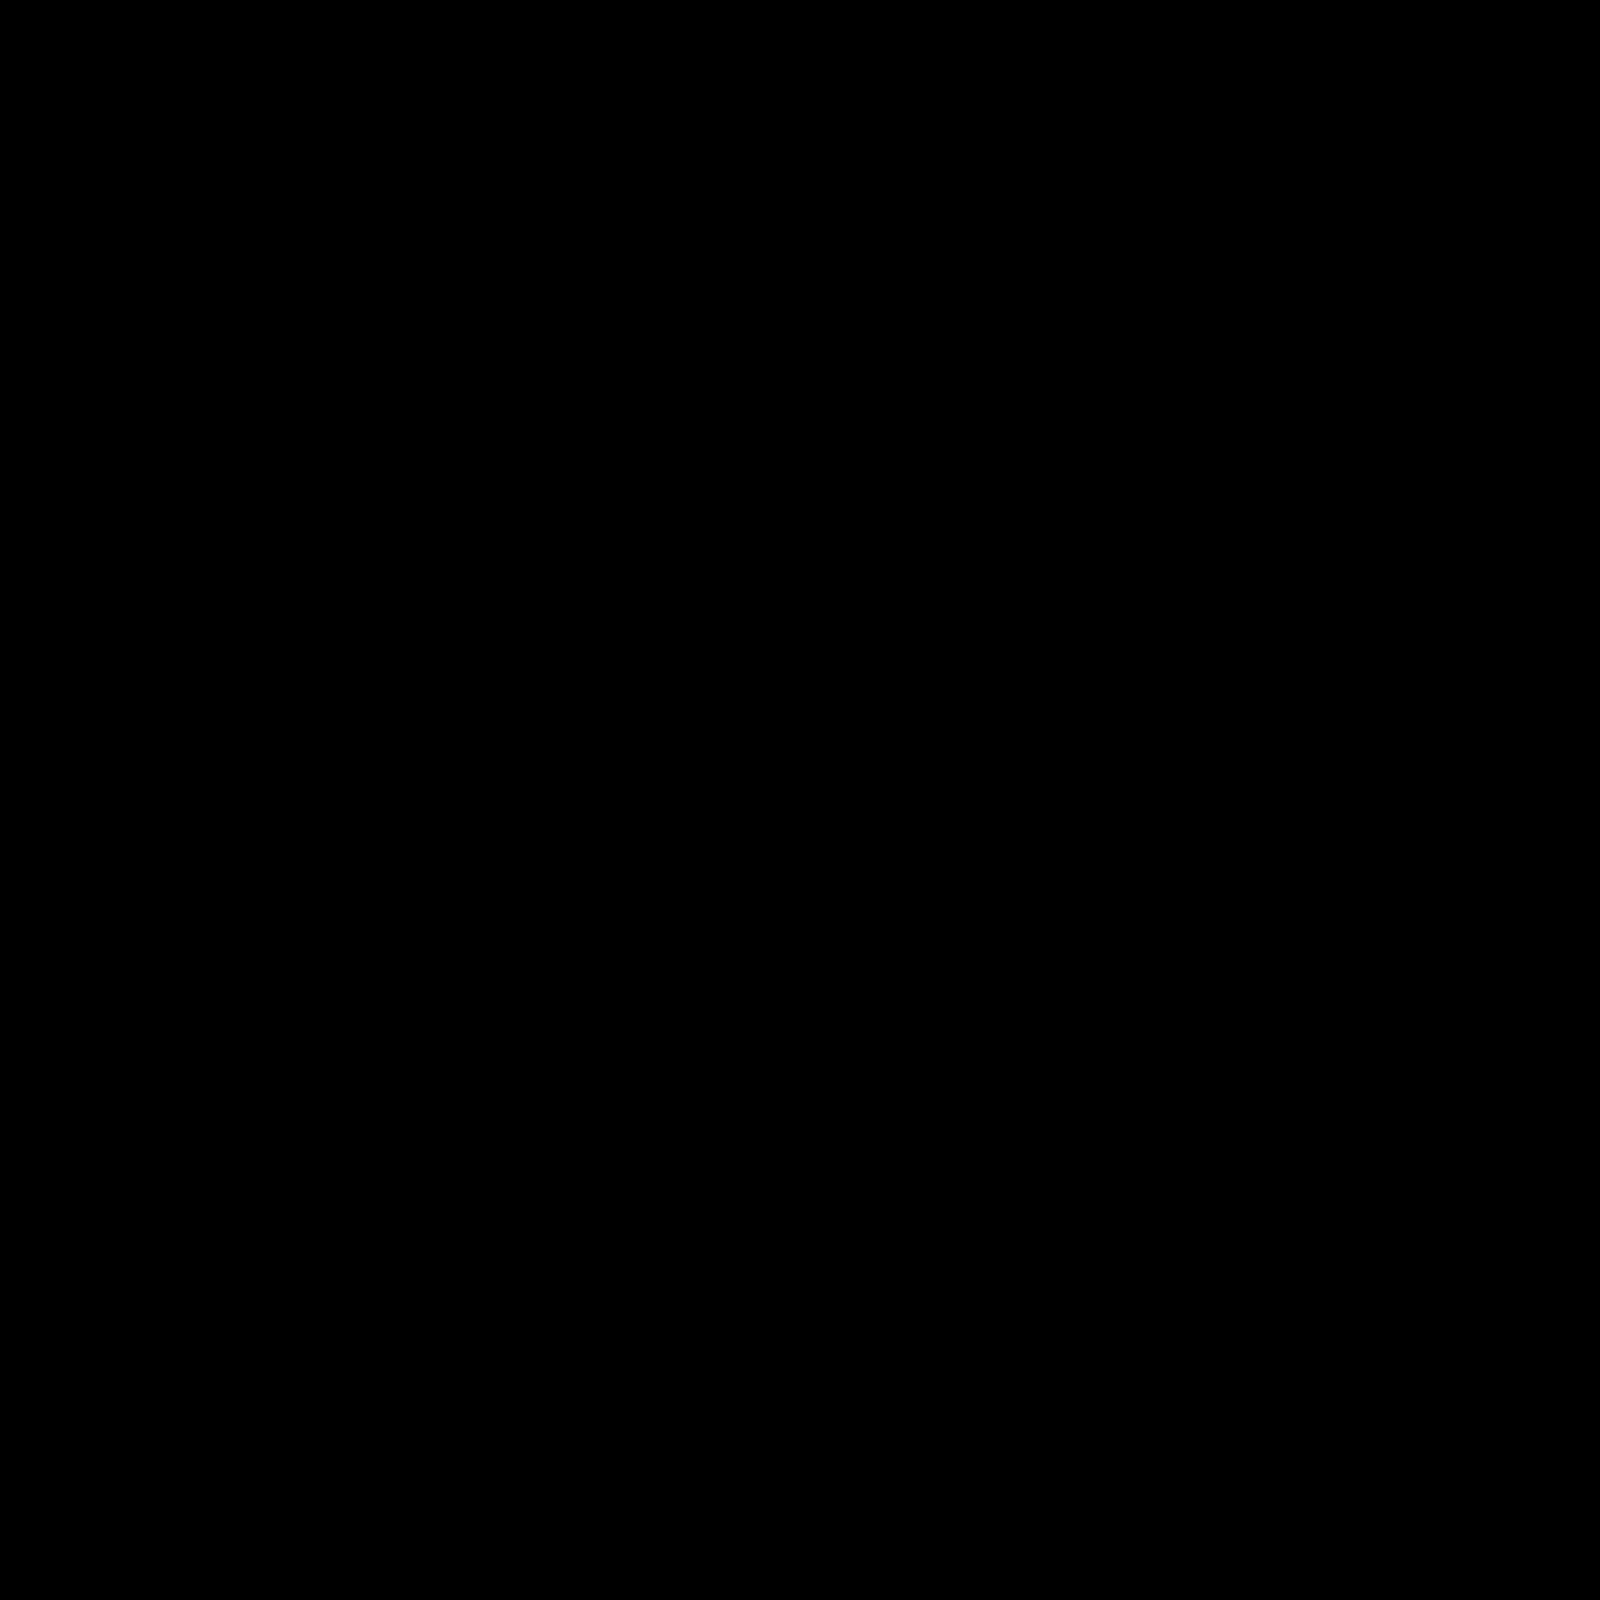 Subaru icon. PNG 50 px - Subaru PNG